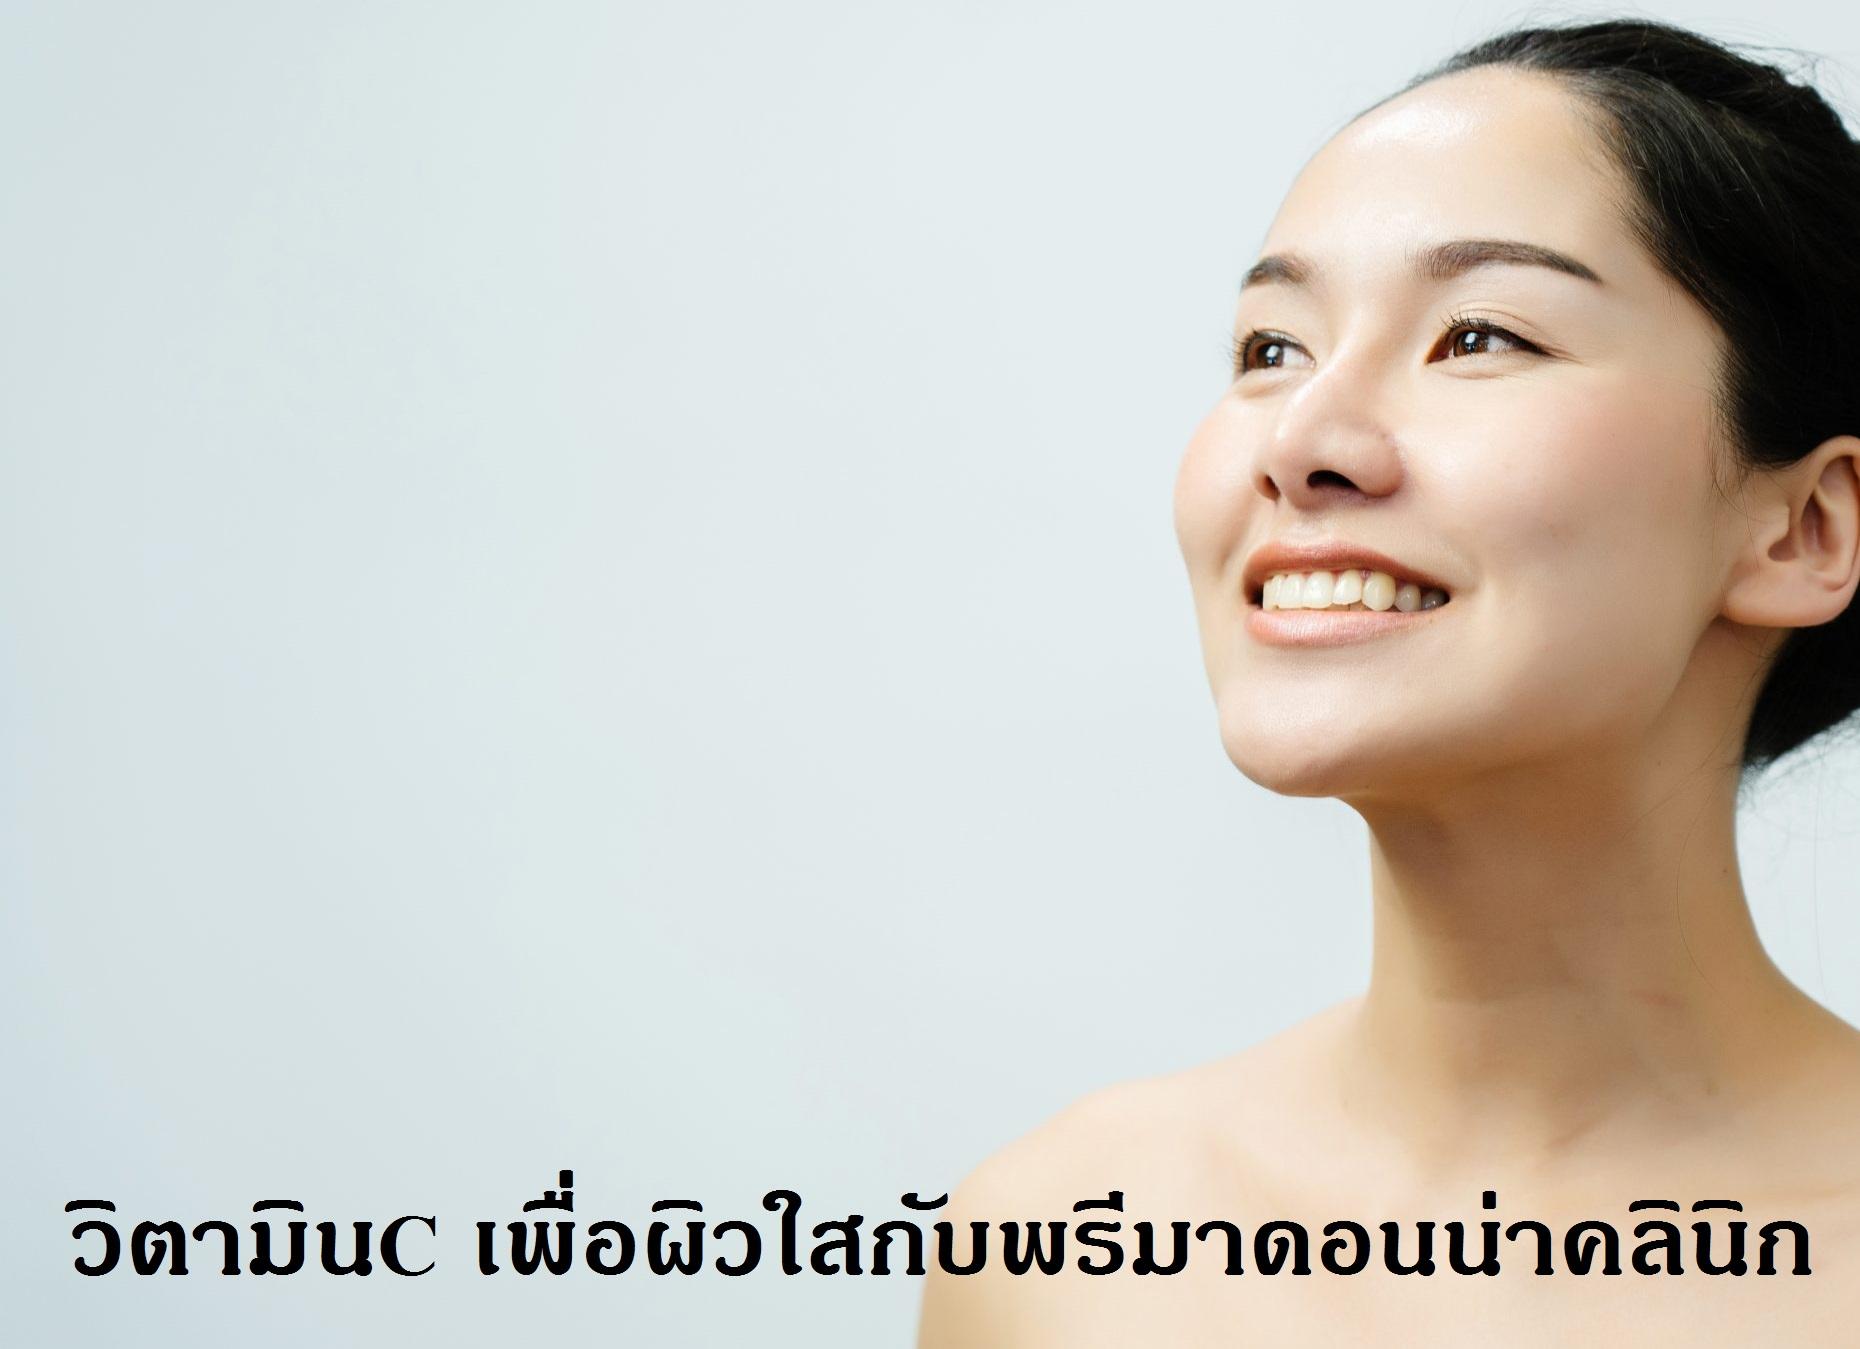 Vitamin C Injection in Chiangmai